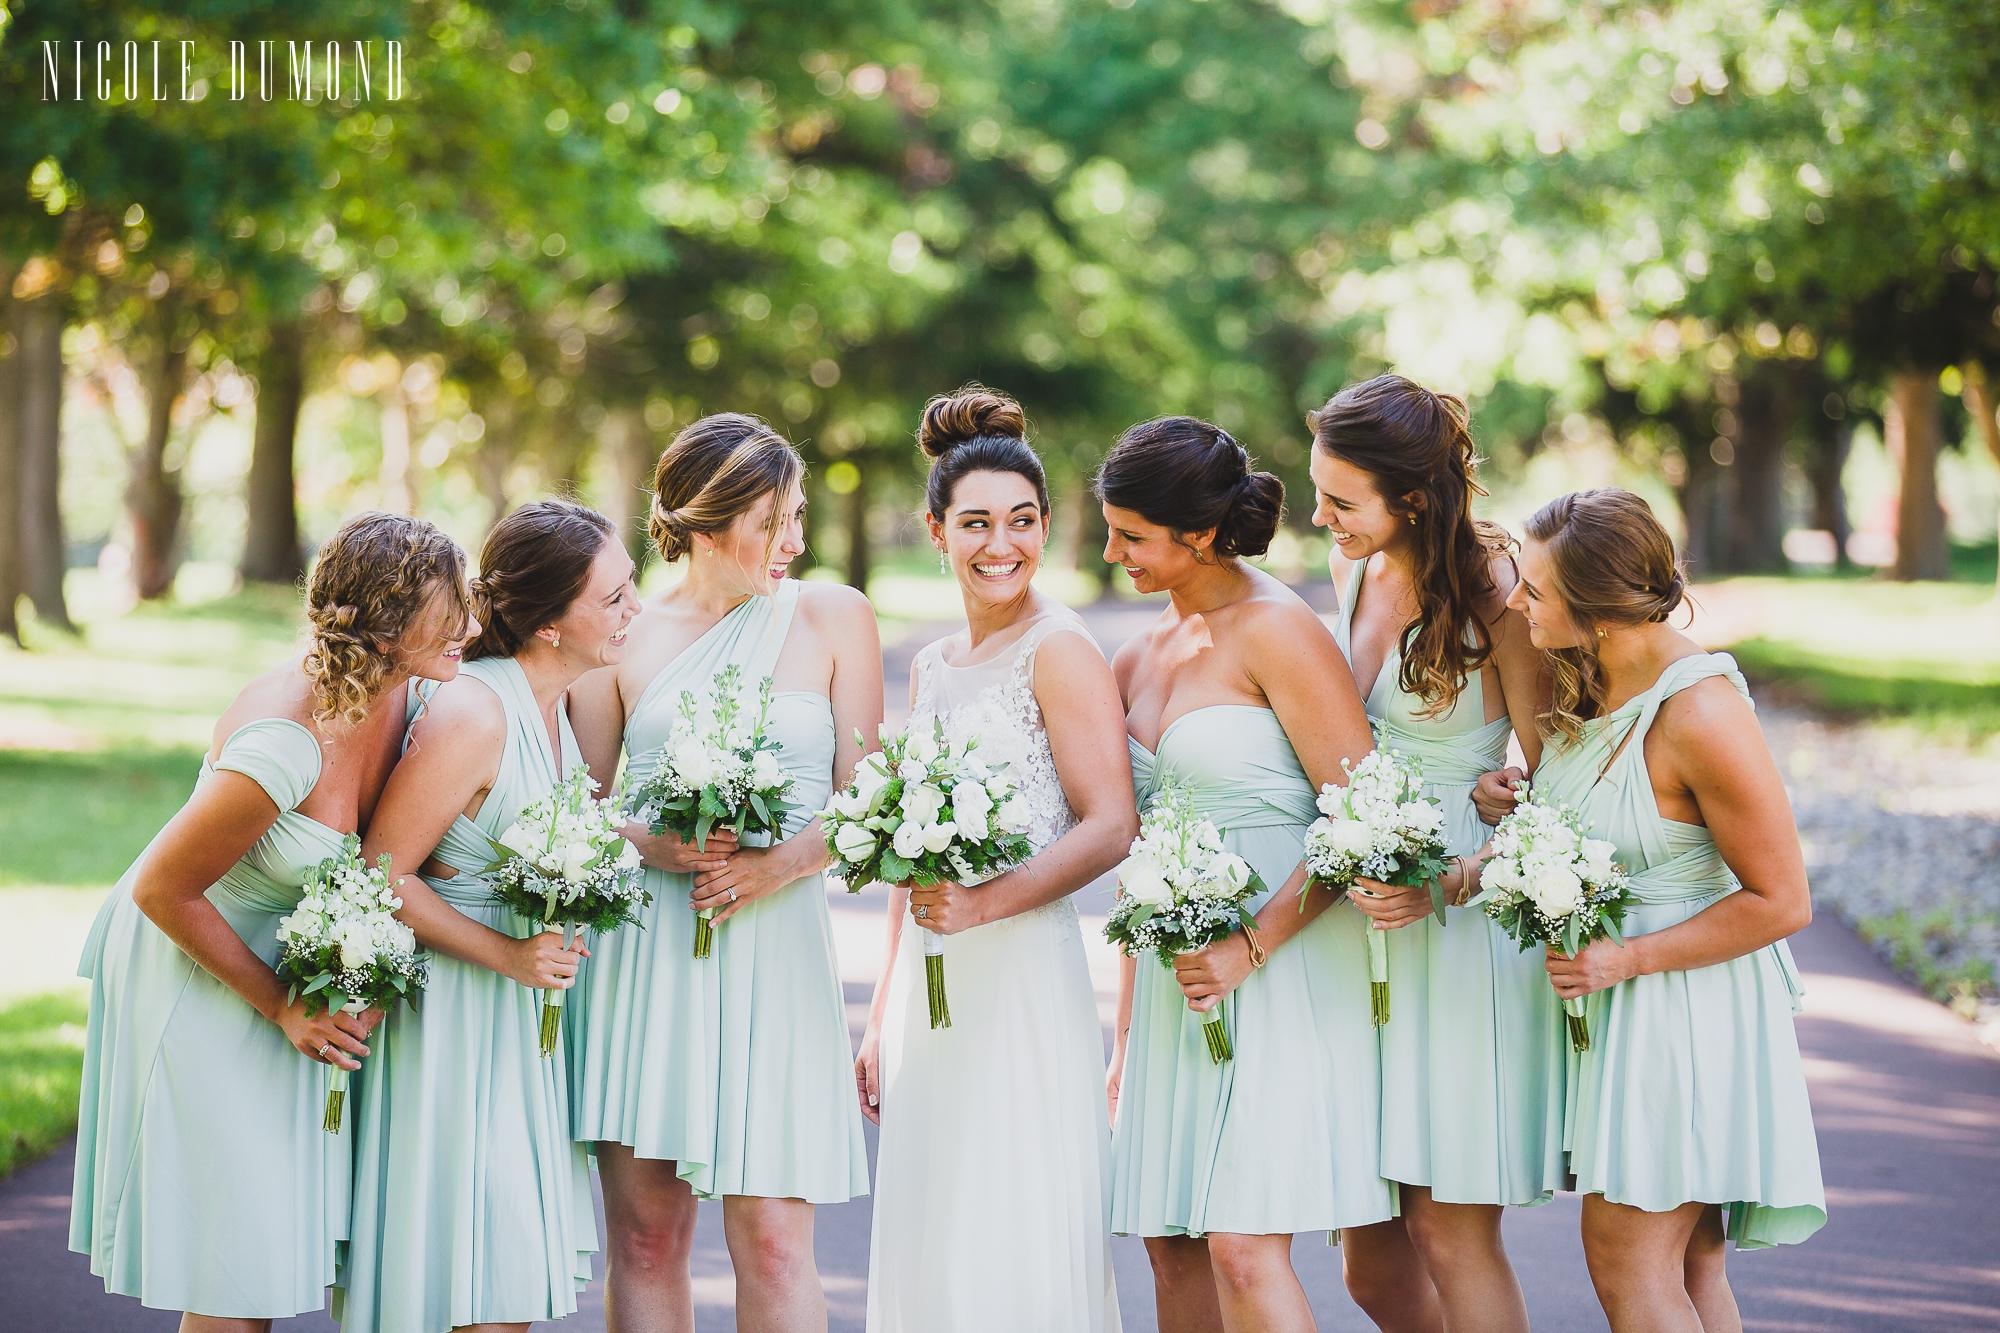 Frosty-valley-danville-wedding-7830